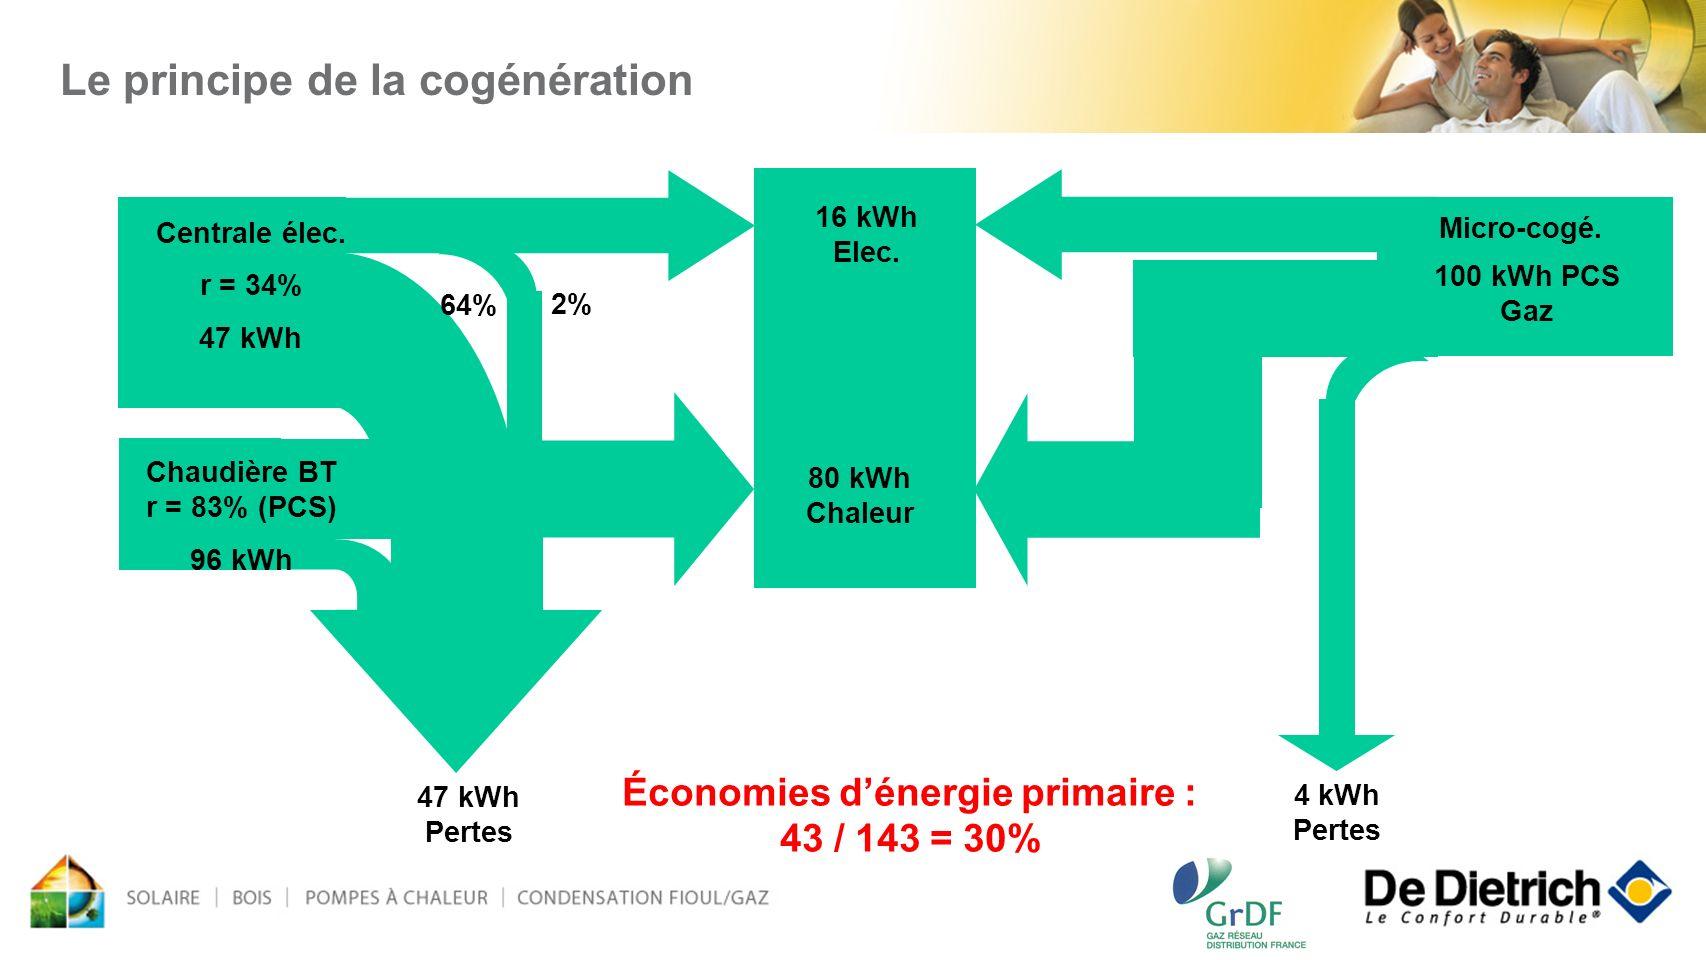 80 kWh Chaleur Micro-cogé. 16 kWh Elec. 4 kWh Pertes 100 kWh PCS Gaz Chaudière BT r = 83% (PCS) 96 kWh 47 kWh Pertes Centrale élec. r = 34% 47 kWh 2%